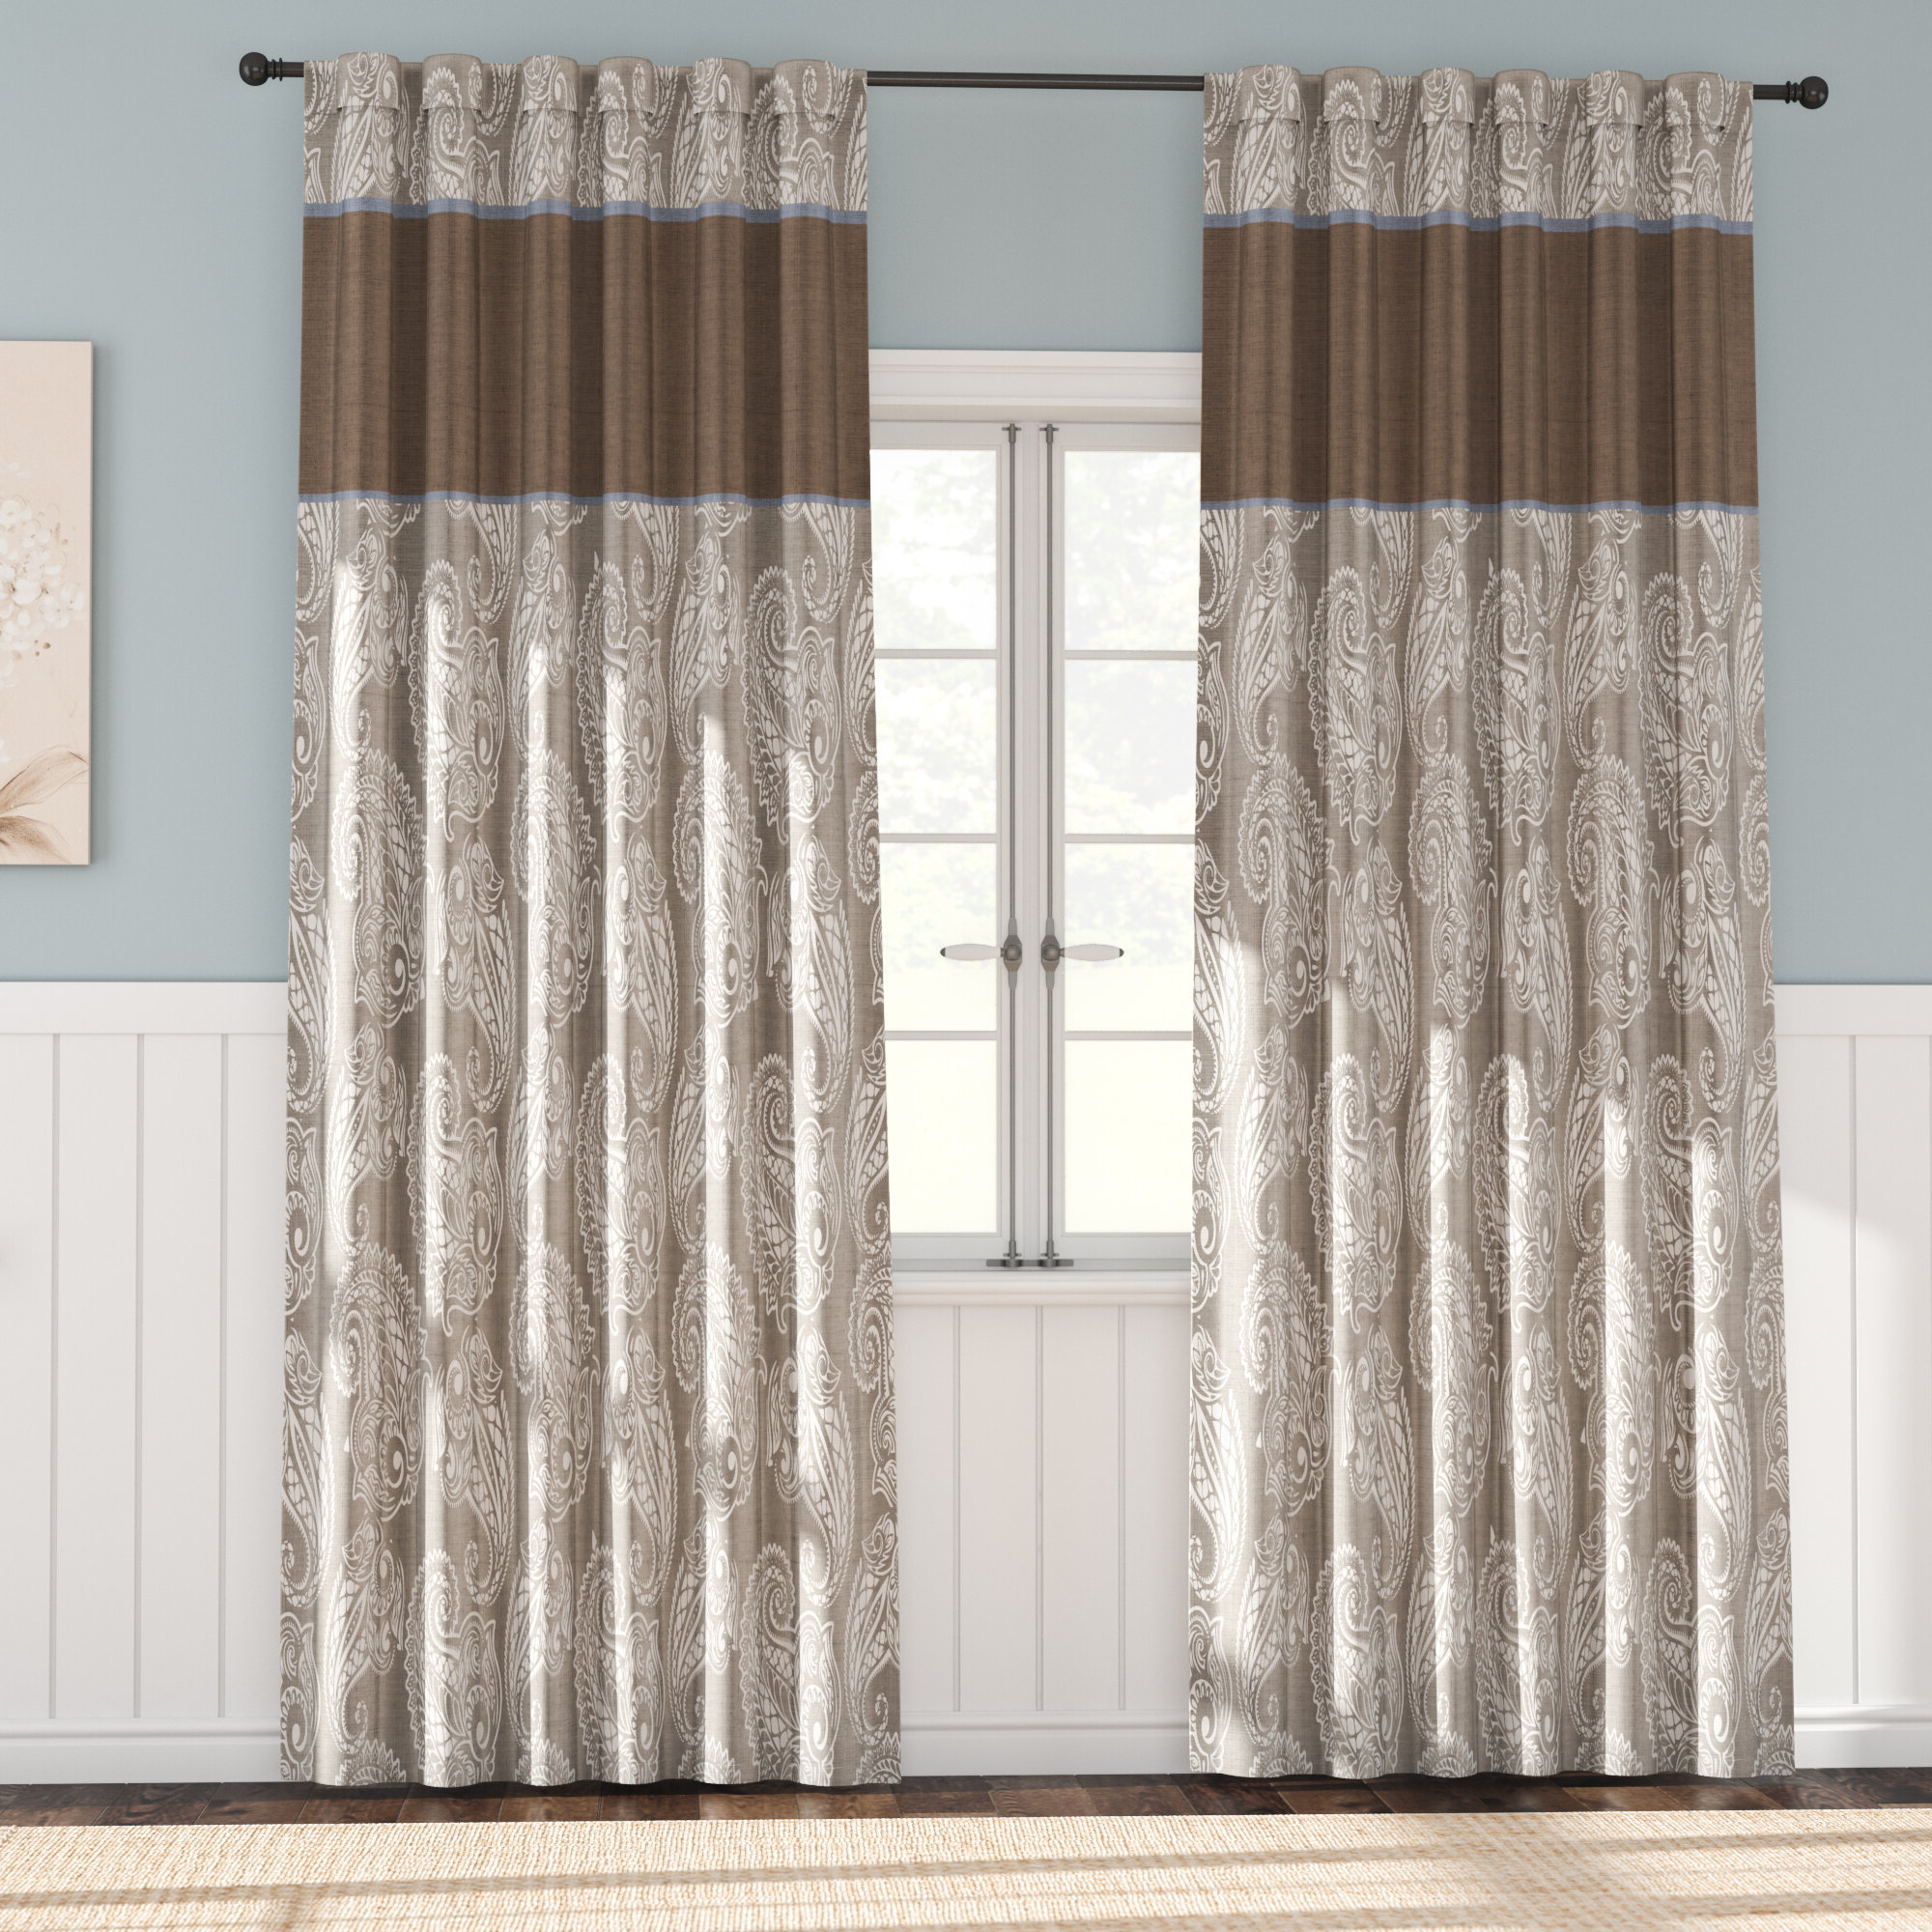 Pokanoket Paisley Room Darkening Rod Pocket Curtain Pertaining To Newest Julia Striped Room Darkening Window Curtain Panel Pairs (View 17 of 20)